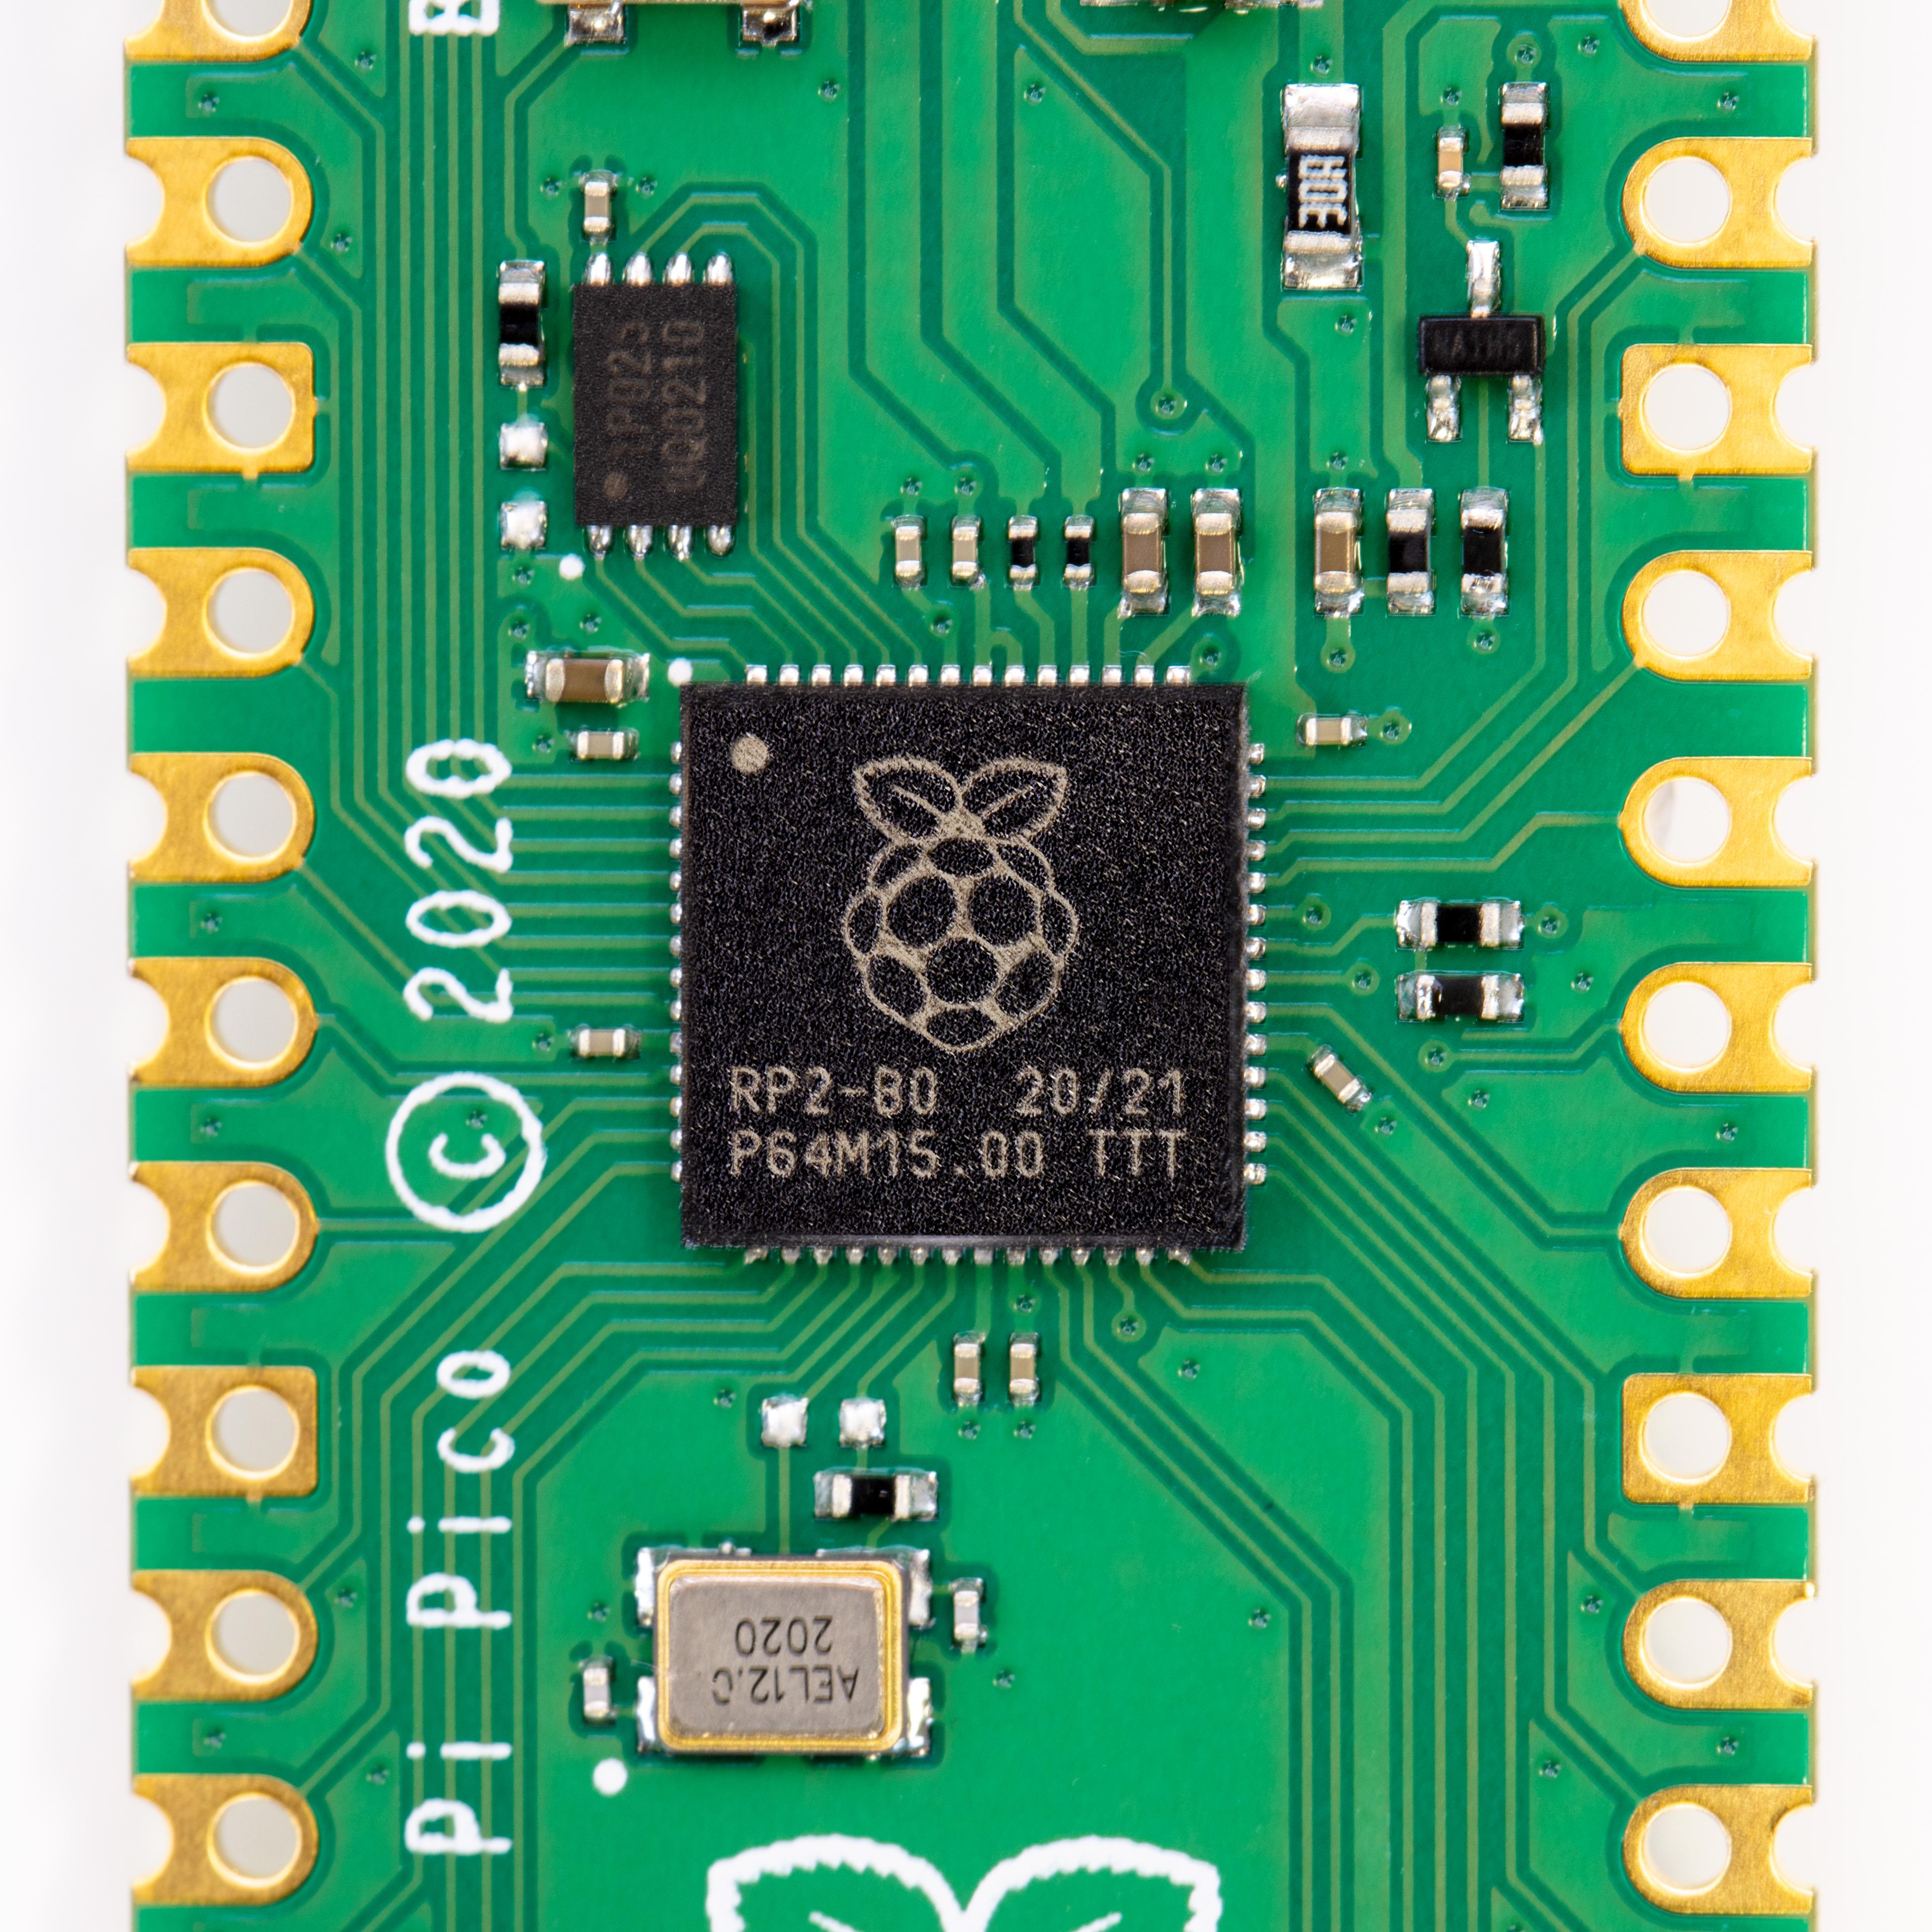 Raspberry Pi Pico RP2040 Microcontroller Board